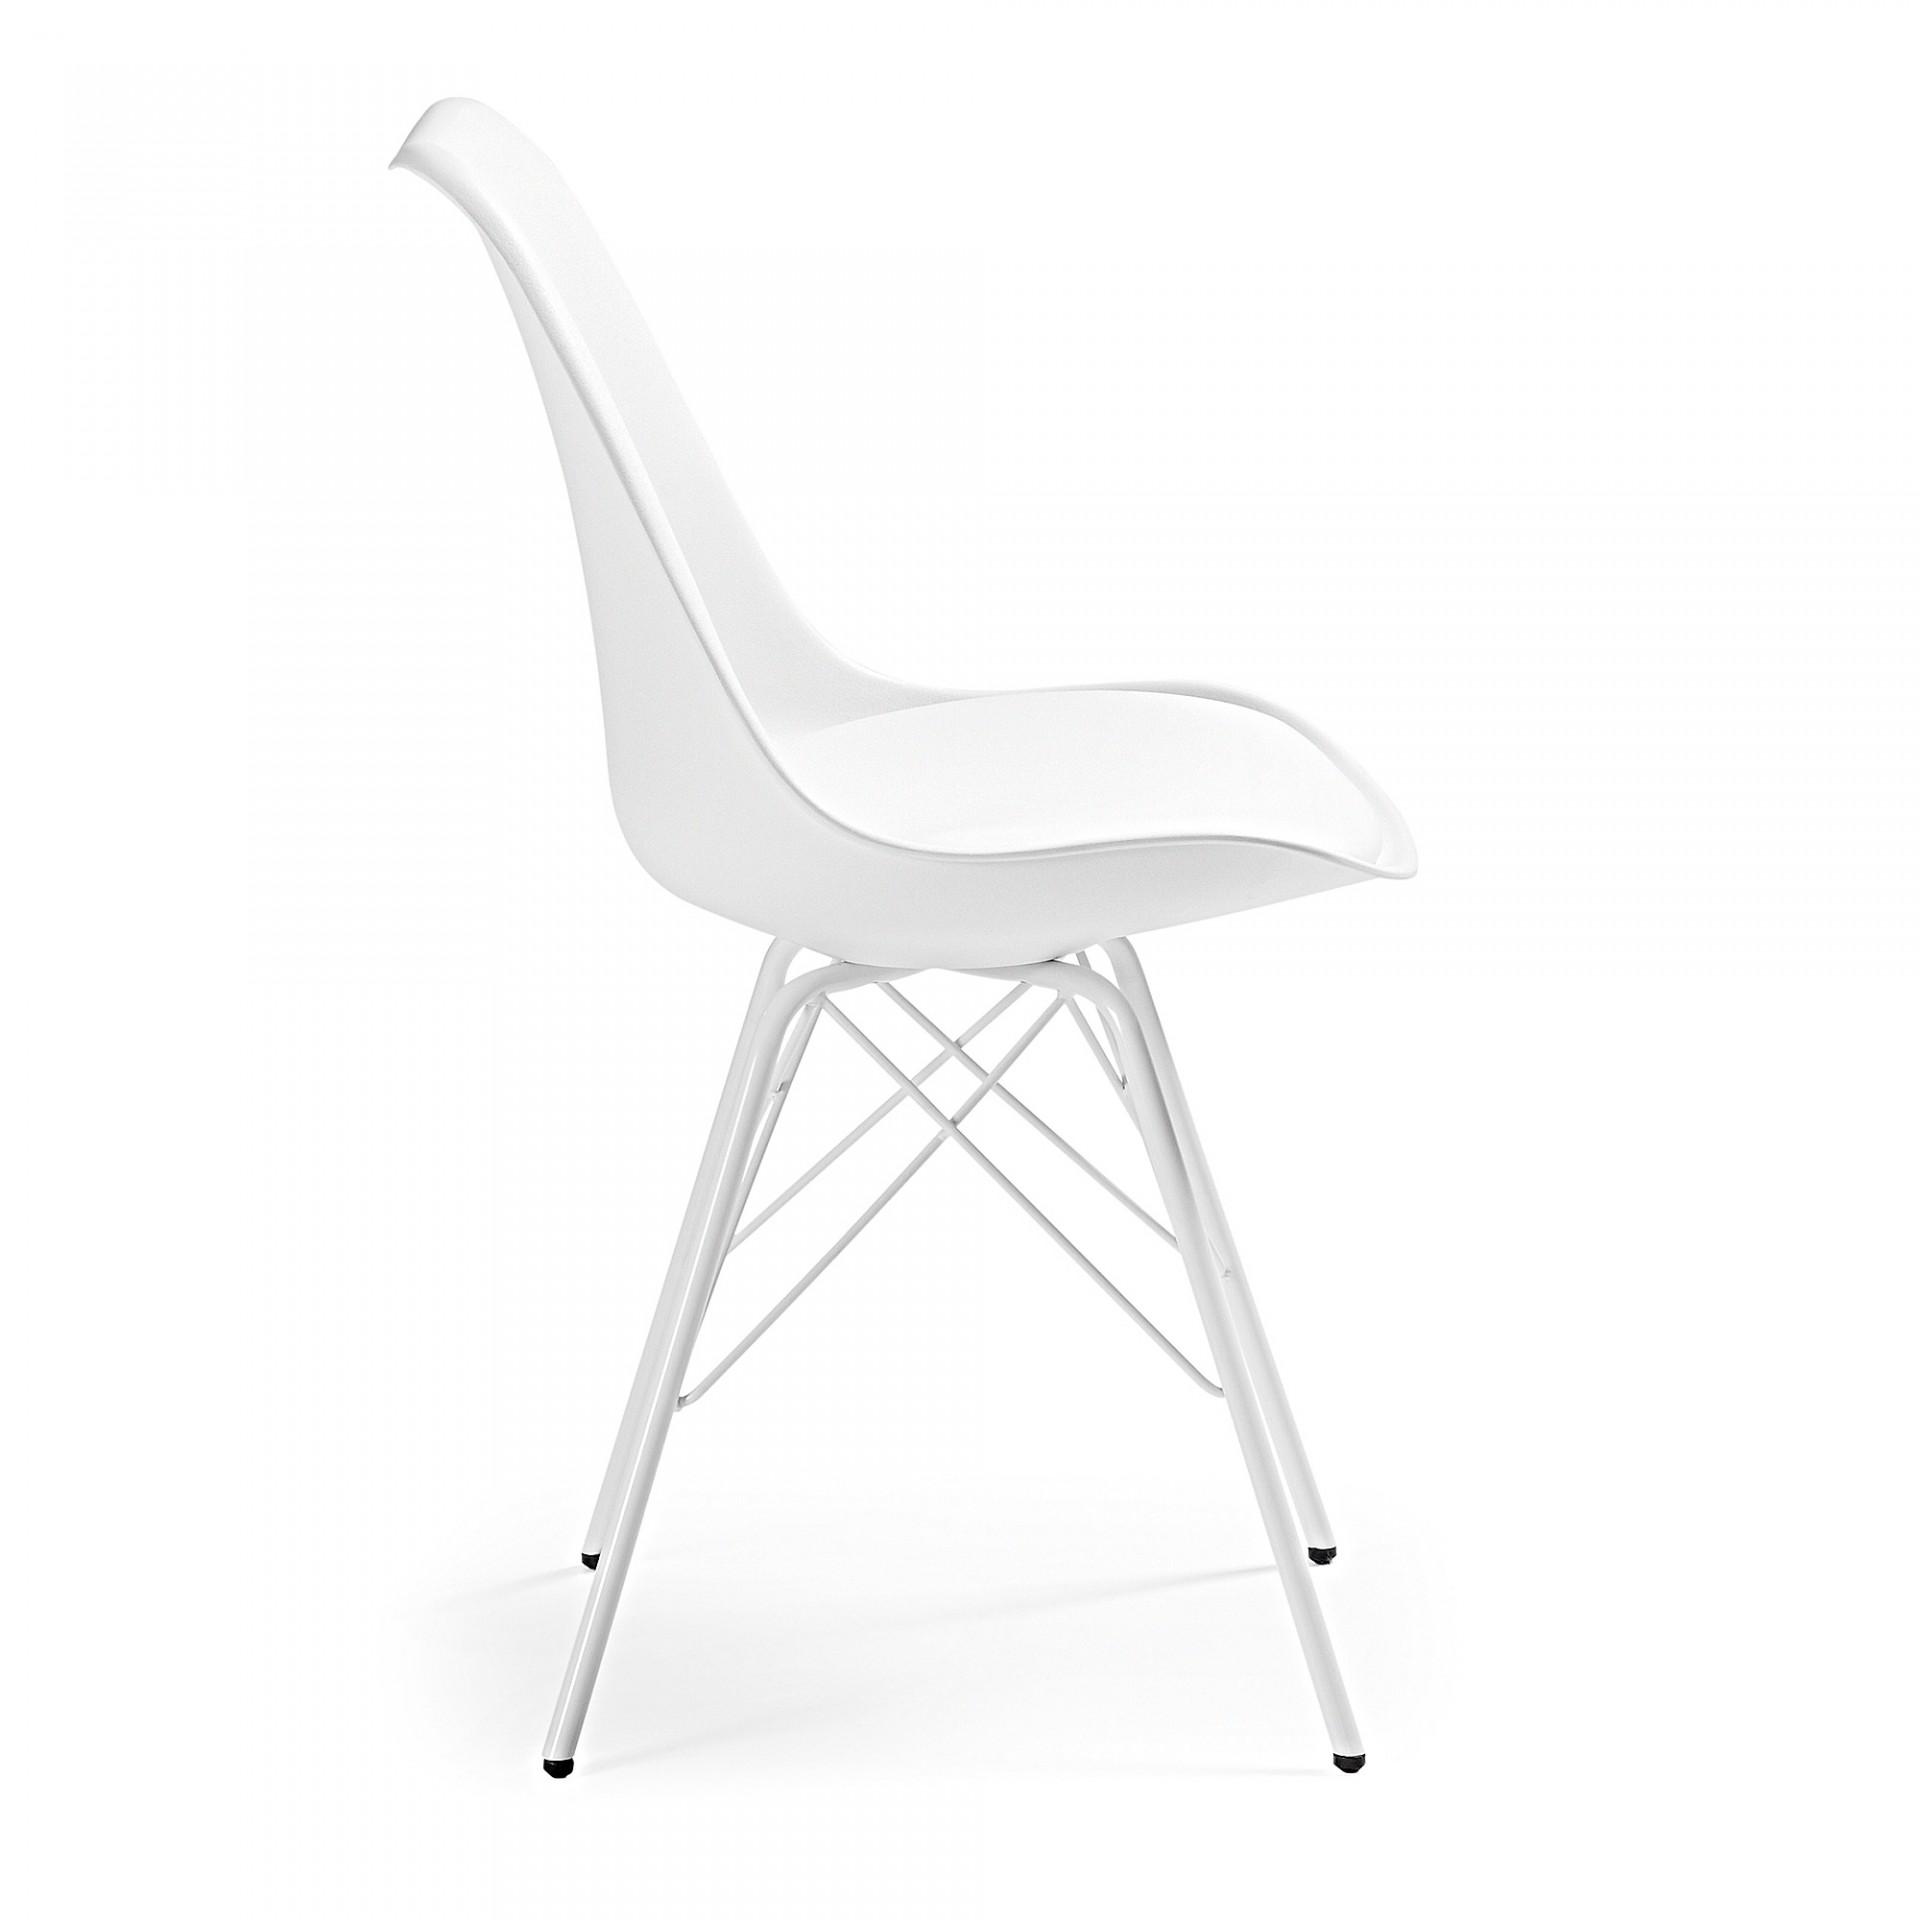 Cadeira Rafe, assento acolchoado